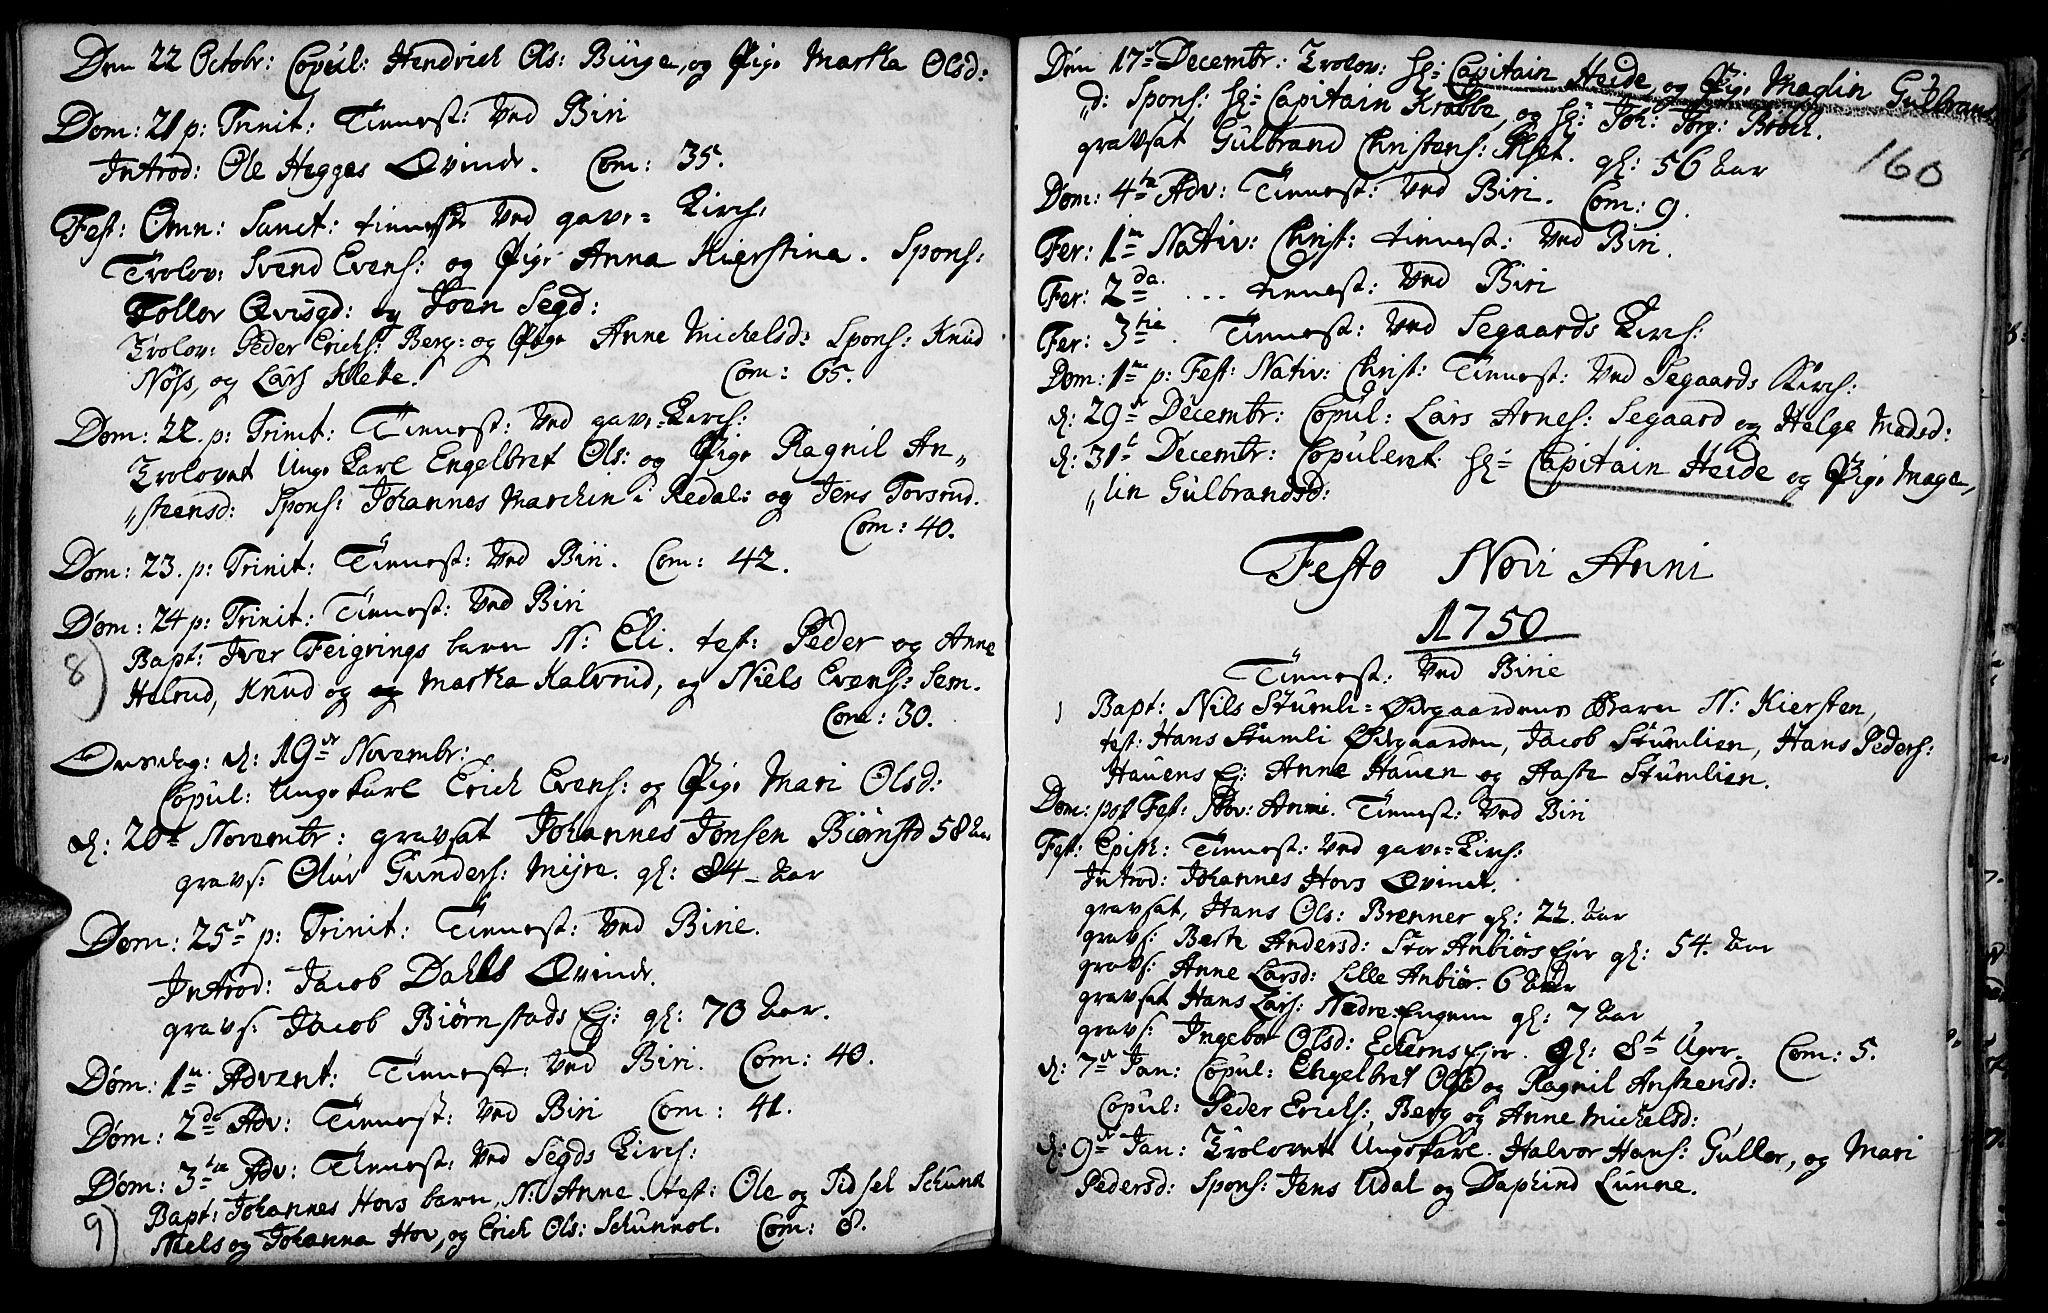 SAH, Biri prestekontor, Ministerialbok nr. 1, 1730-1754, s. 160